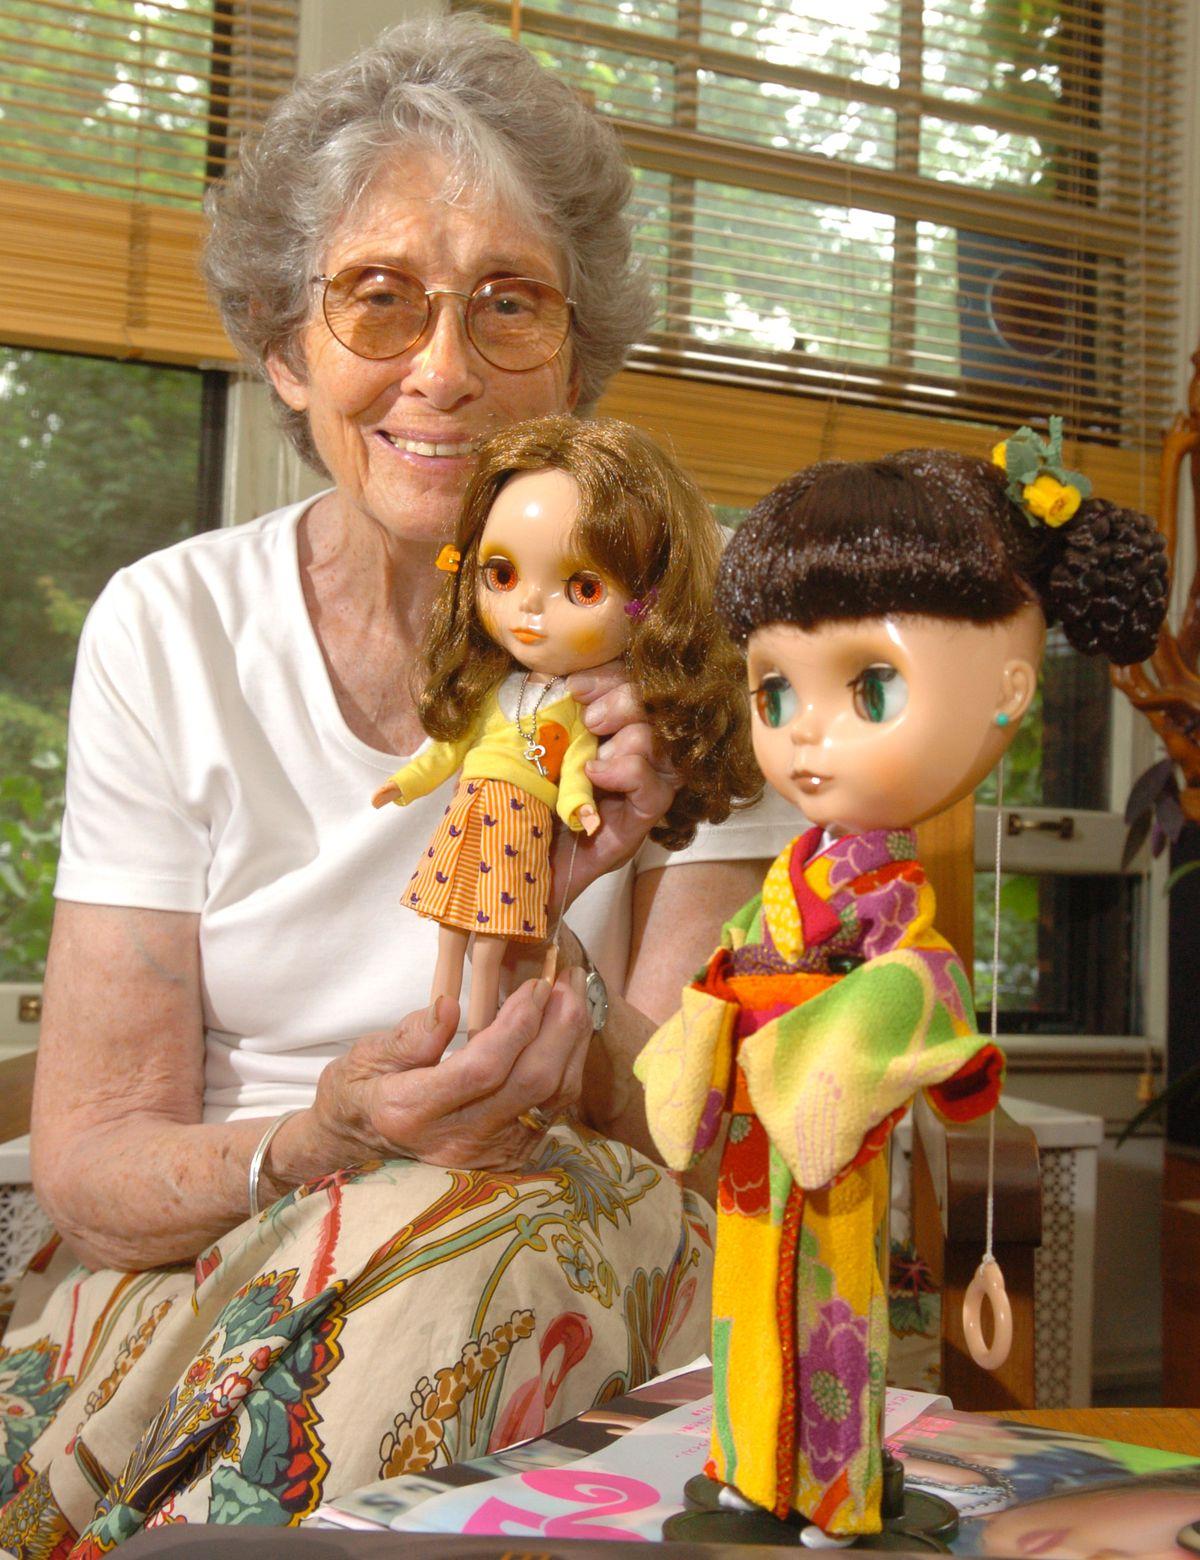 Allison Katzman in 2006 with Blythe dolls she designed.